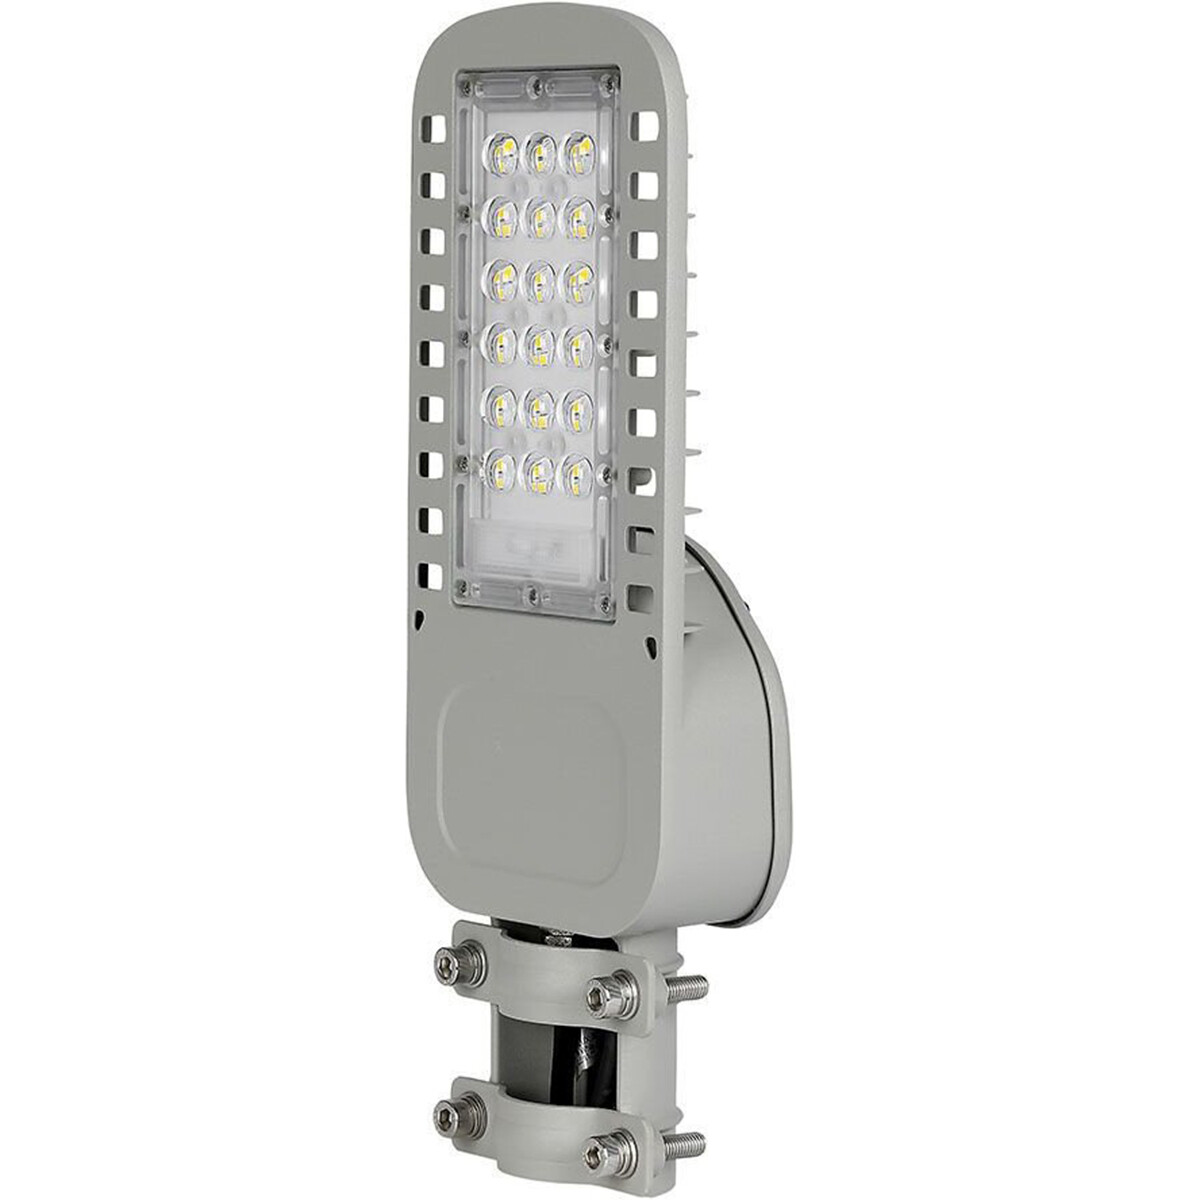 SAMSUNG - LED Straatlamp Slim - Viron Unato - 30W - Natuurlijk Wit 4000K - Waterdicht IP65 - Mat Gri